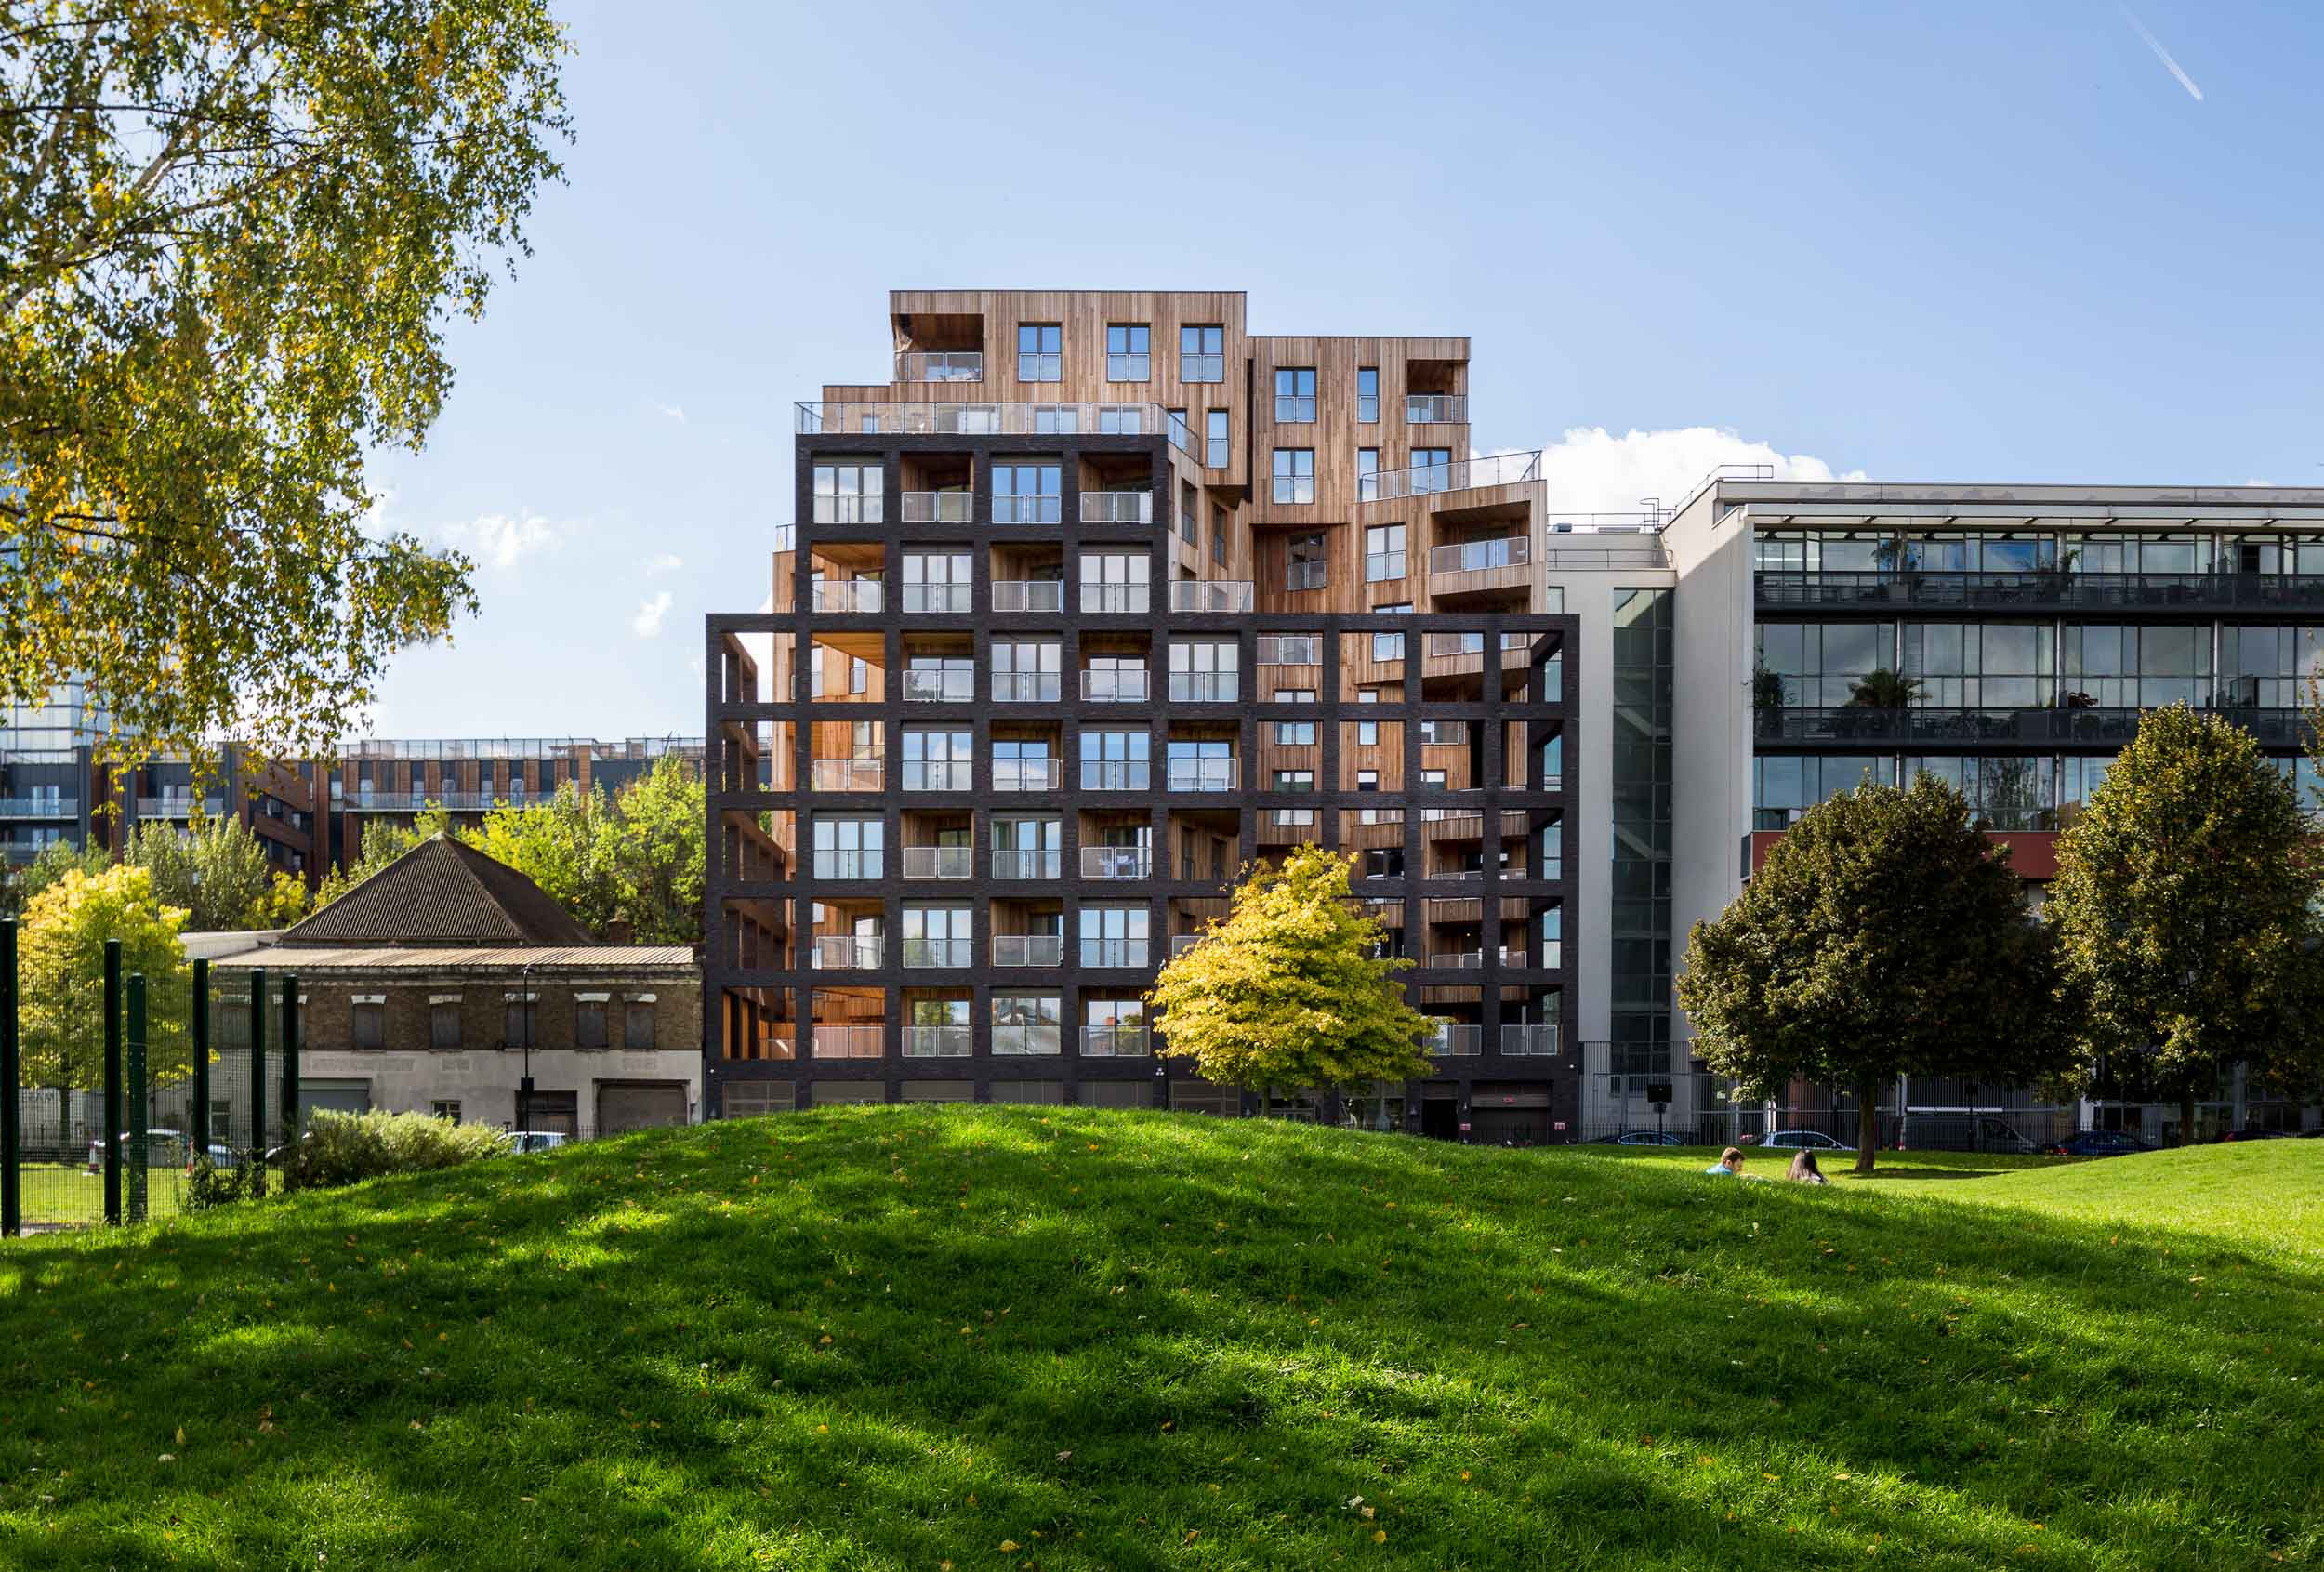 17-21 wenlock road london flats architectural exterior.jpg